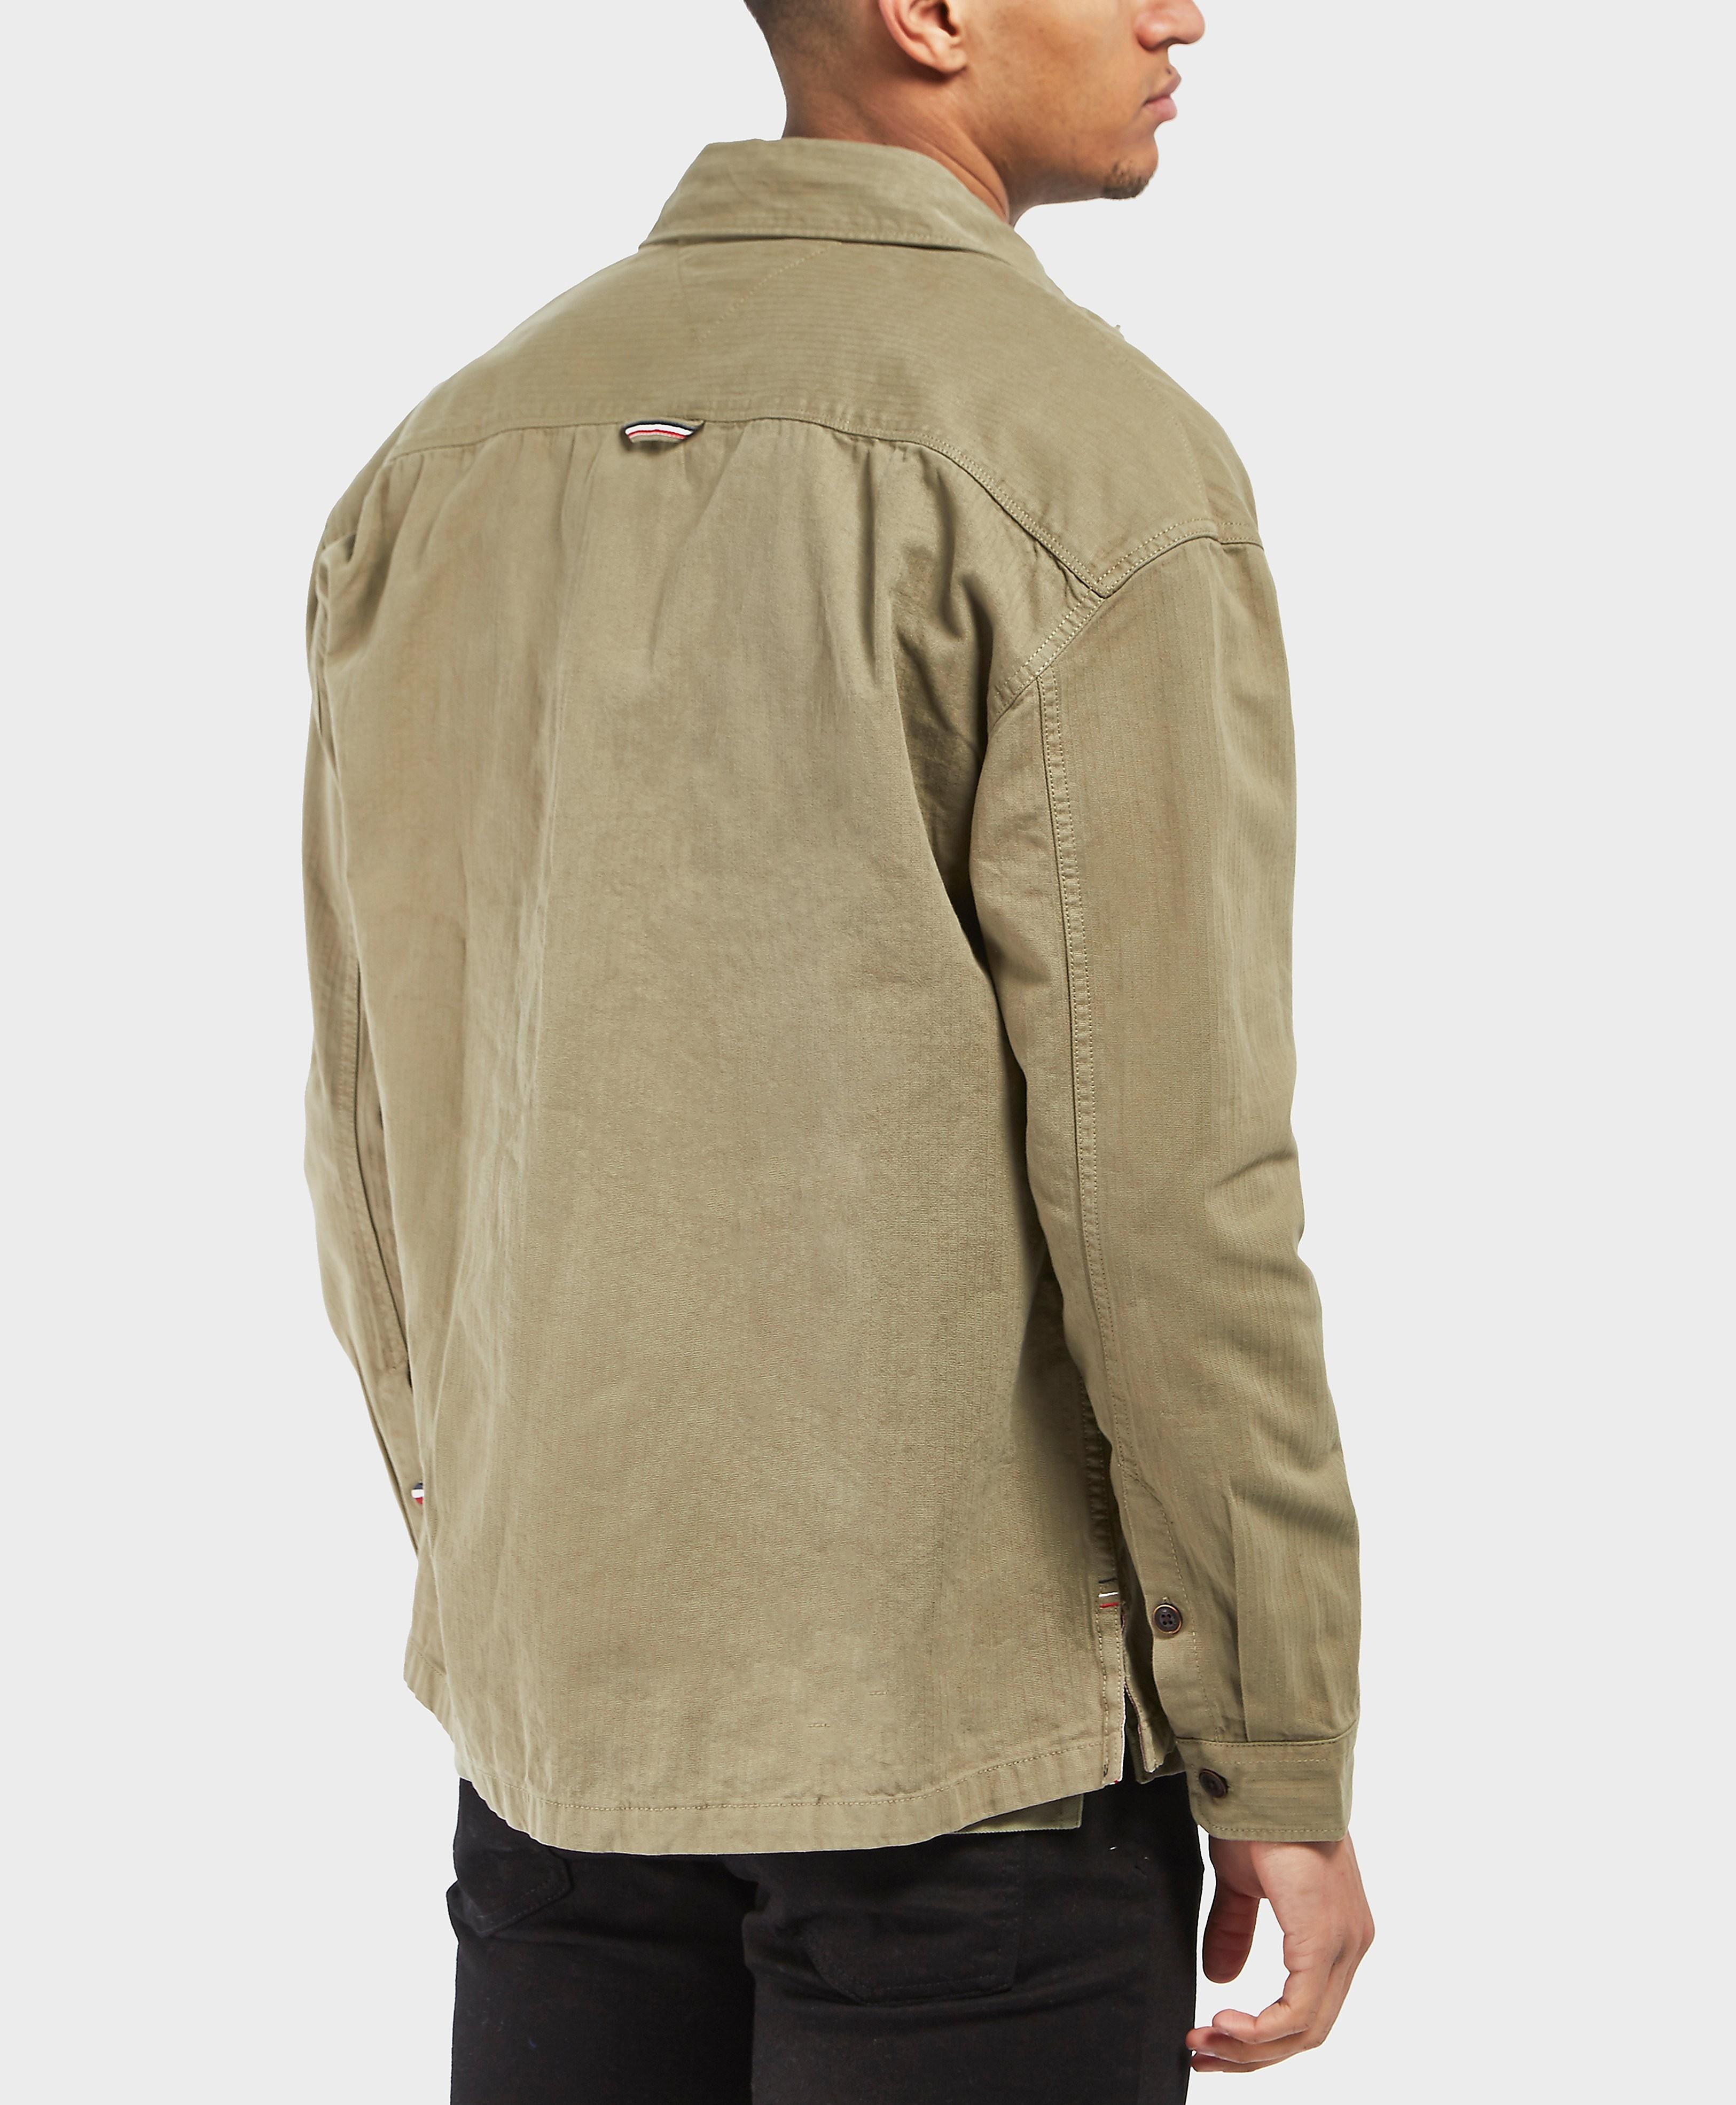 Tommy Hilfiger Workwear Overshirt